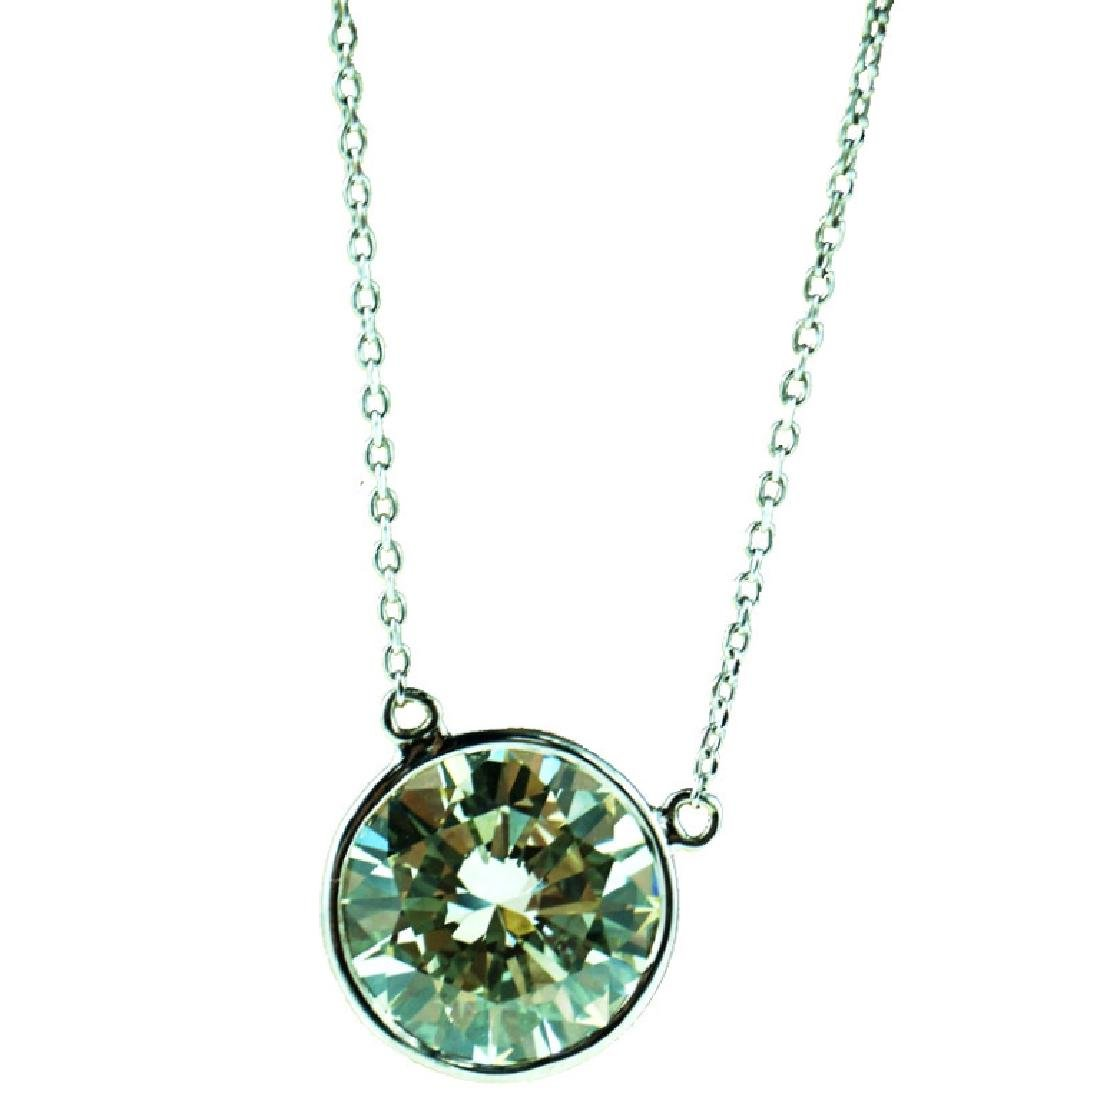 4.85 Carat Bezel Set Diamond Necklace. VS1/L